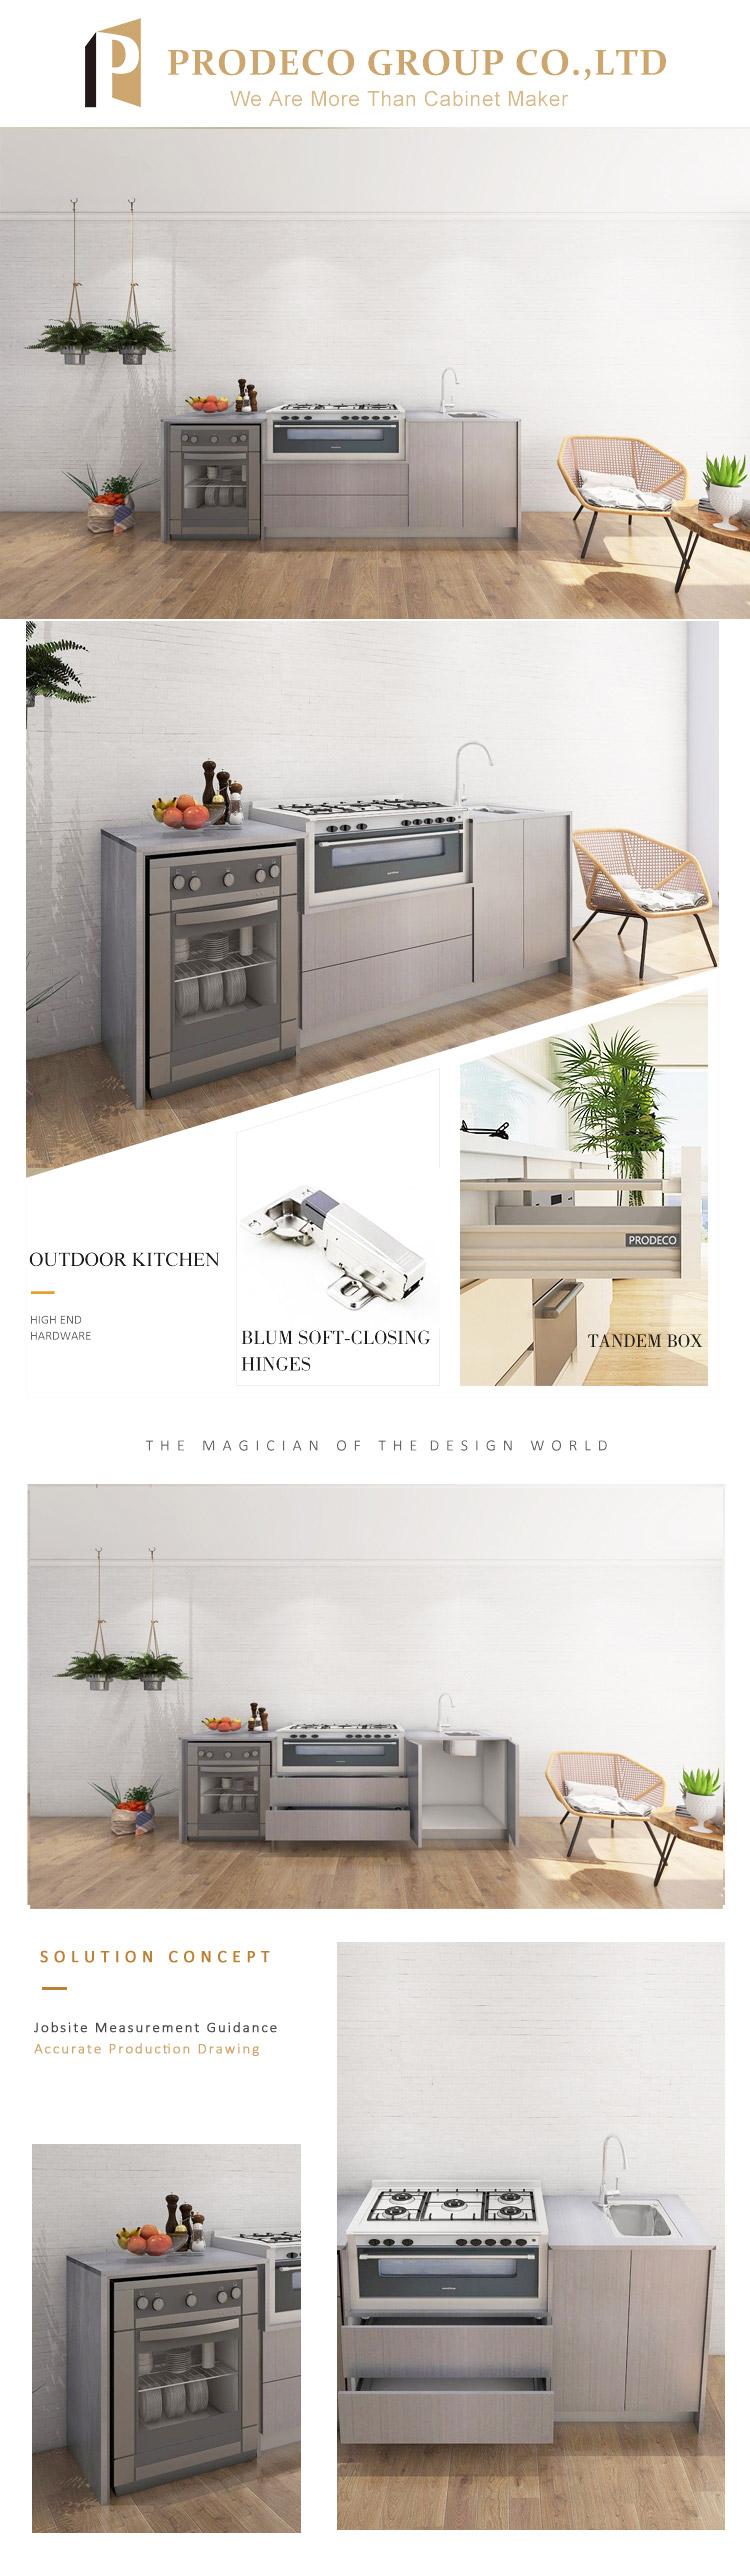 2020 New Design Outdoor Kitchen Stainless Steel Kitchen Cabinet Outdoor Kitchen Cabinets Bbq Buy Outdoor Kitchen Stainless Steel Kitchen Cabinet Outdoor Kitchen Cabinets Product On Alibaba Com